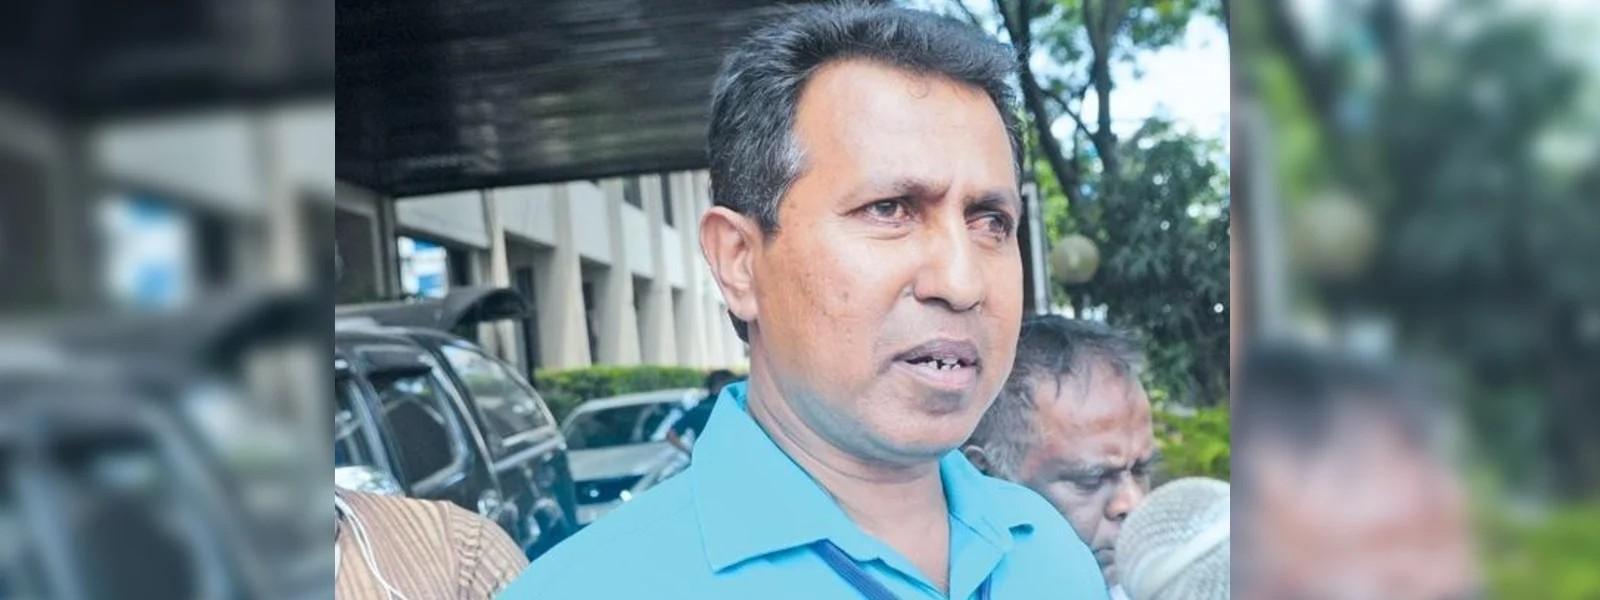 Concerns raised over Sunil Jayawardena's missing mobile phone